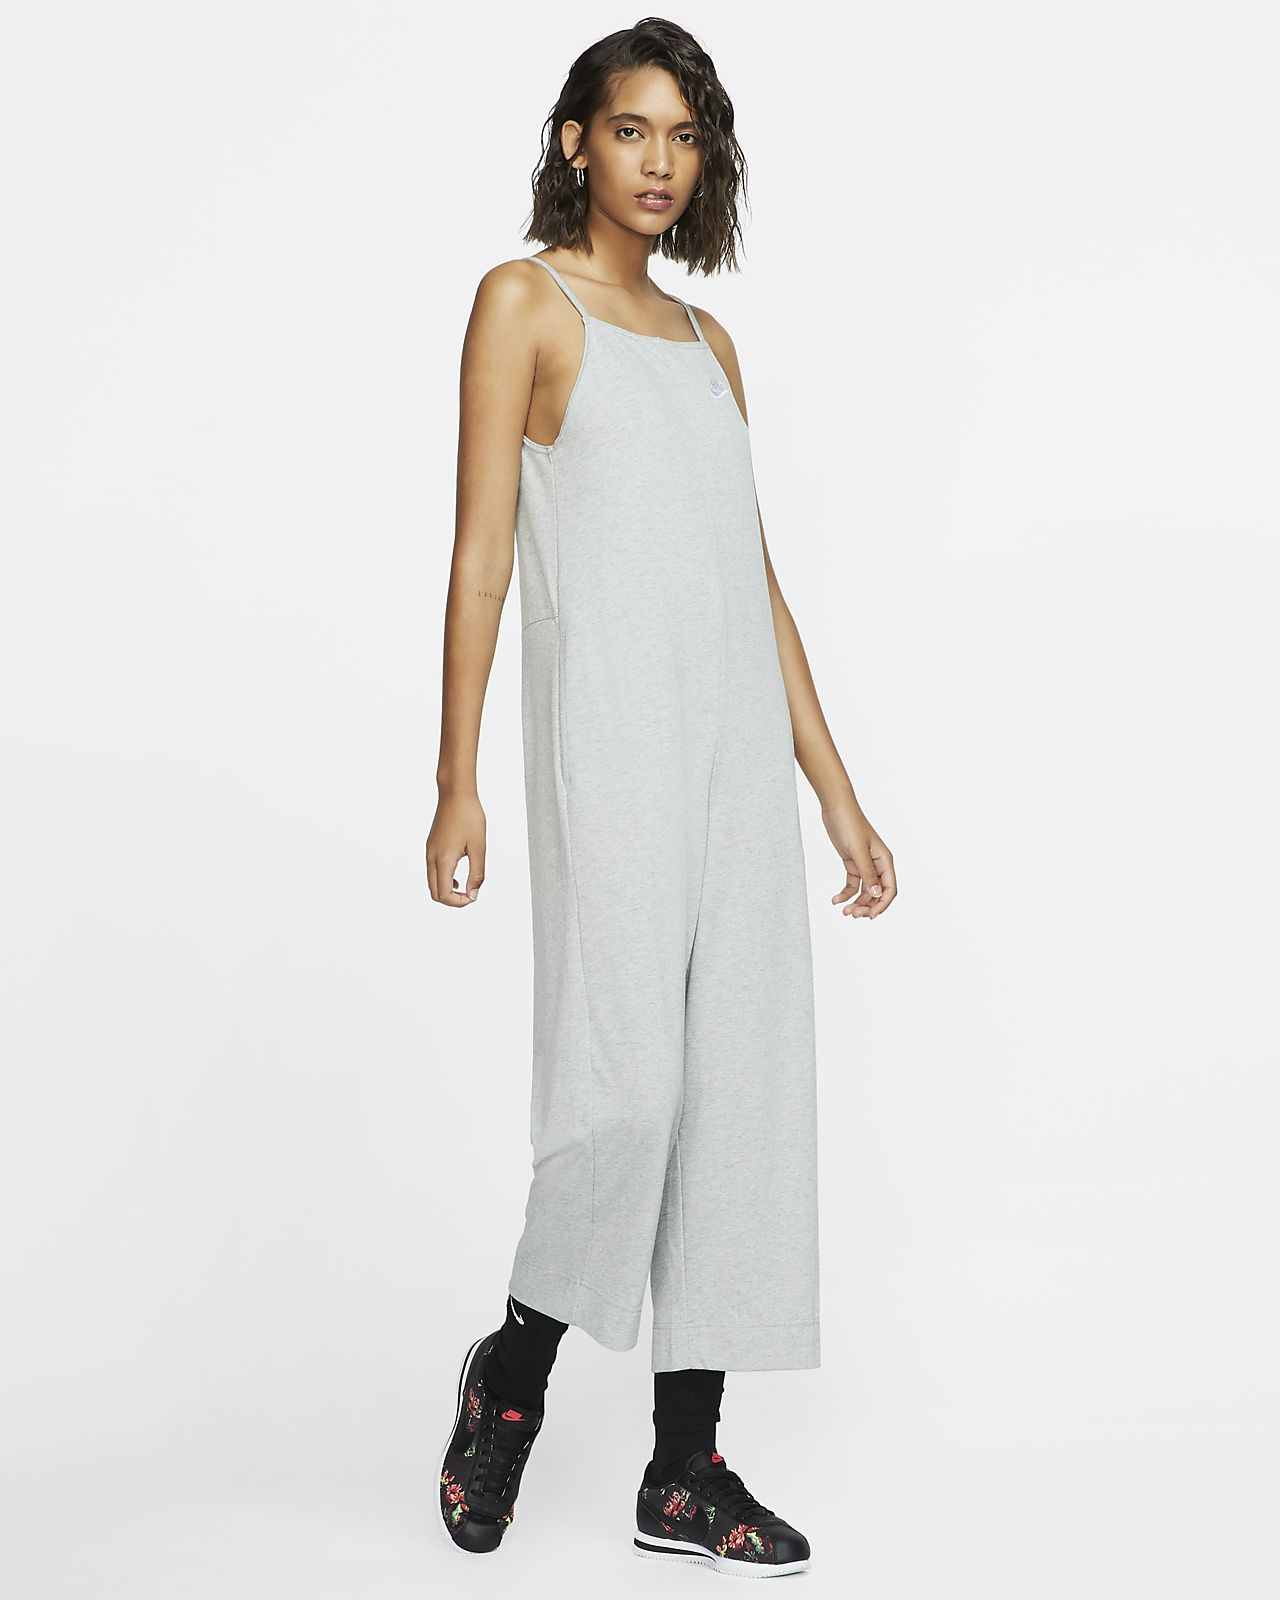 Nike Sportswear buksedress til dame